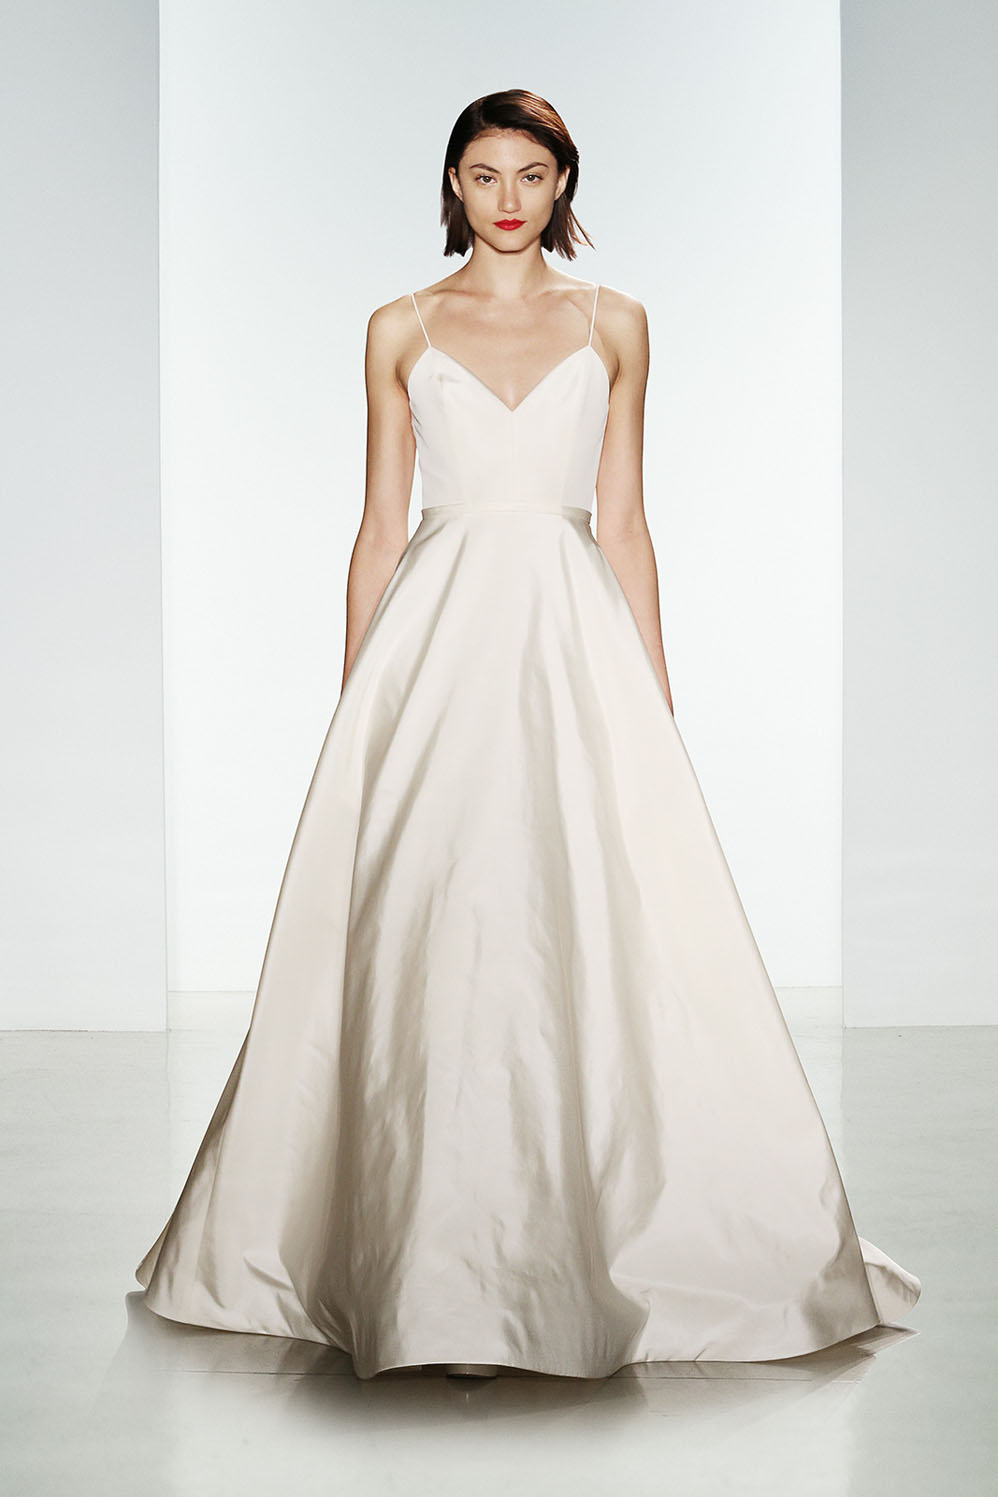 ballgown-wedding-dress-amsale-rowan.jpg